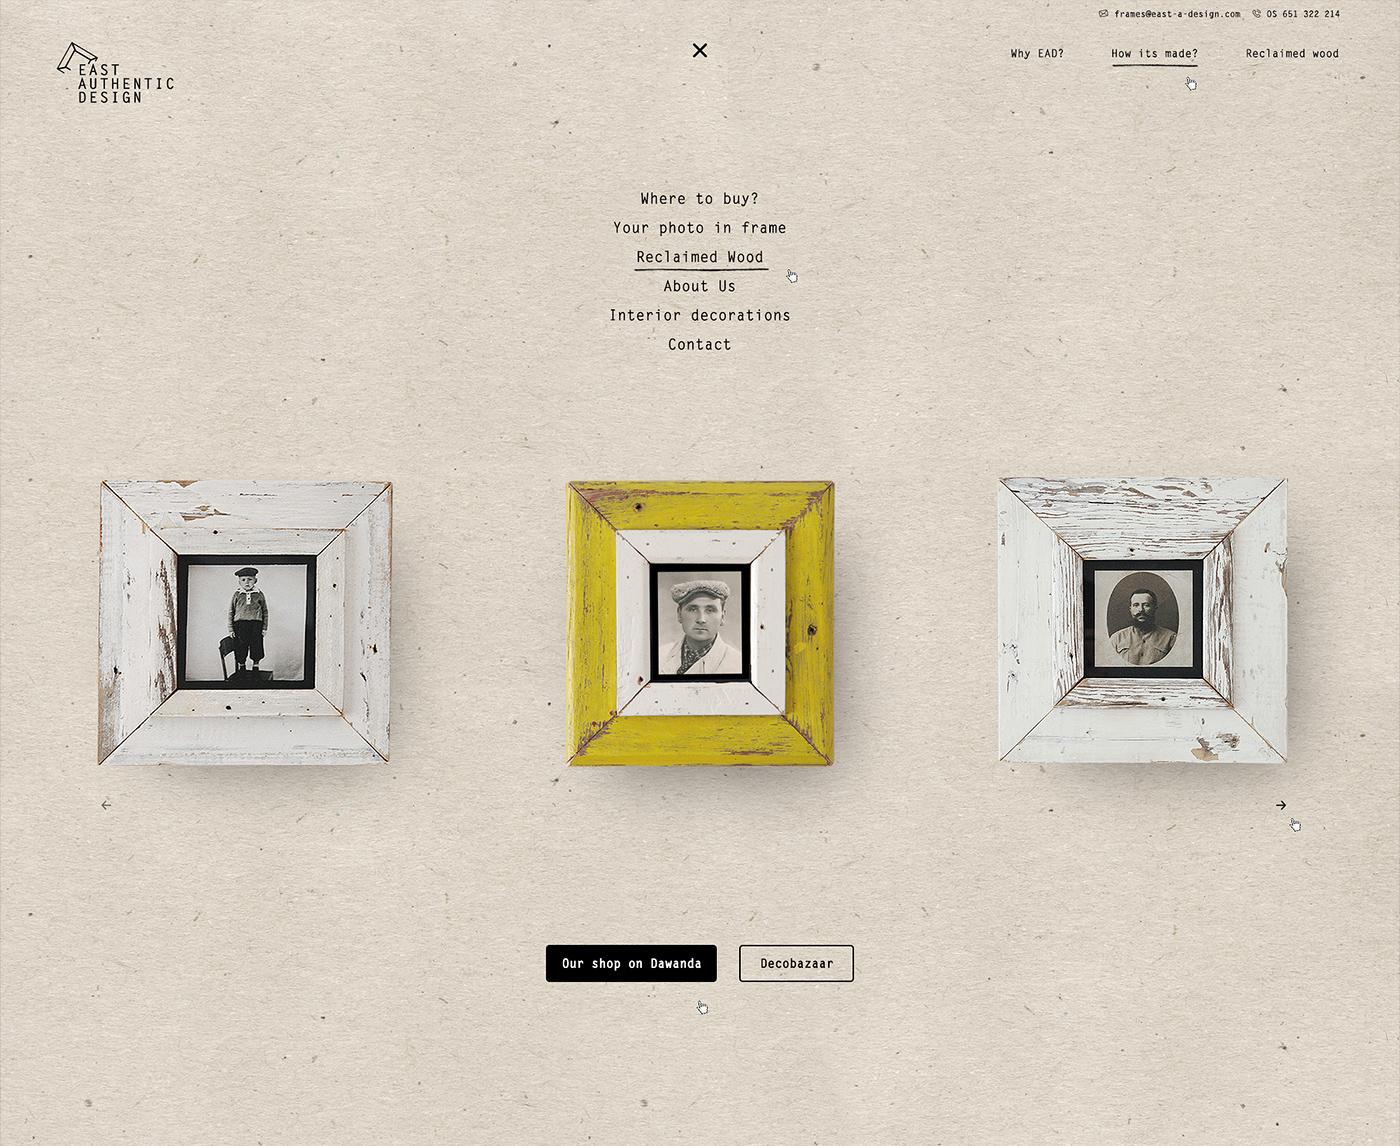 Website frames wooden Art Gallery  gallery art vintage LOFT design decorations